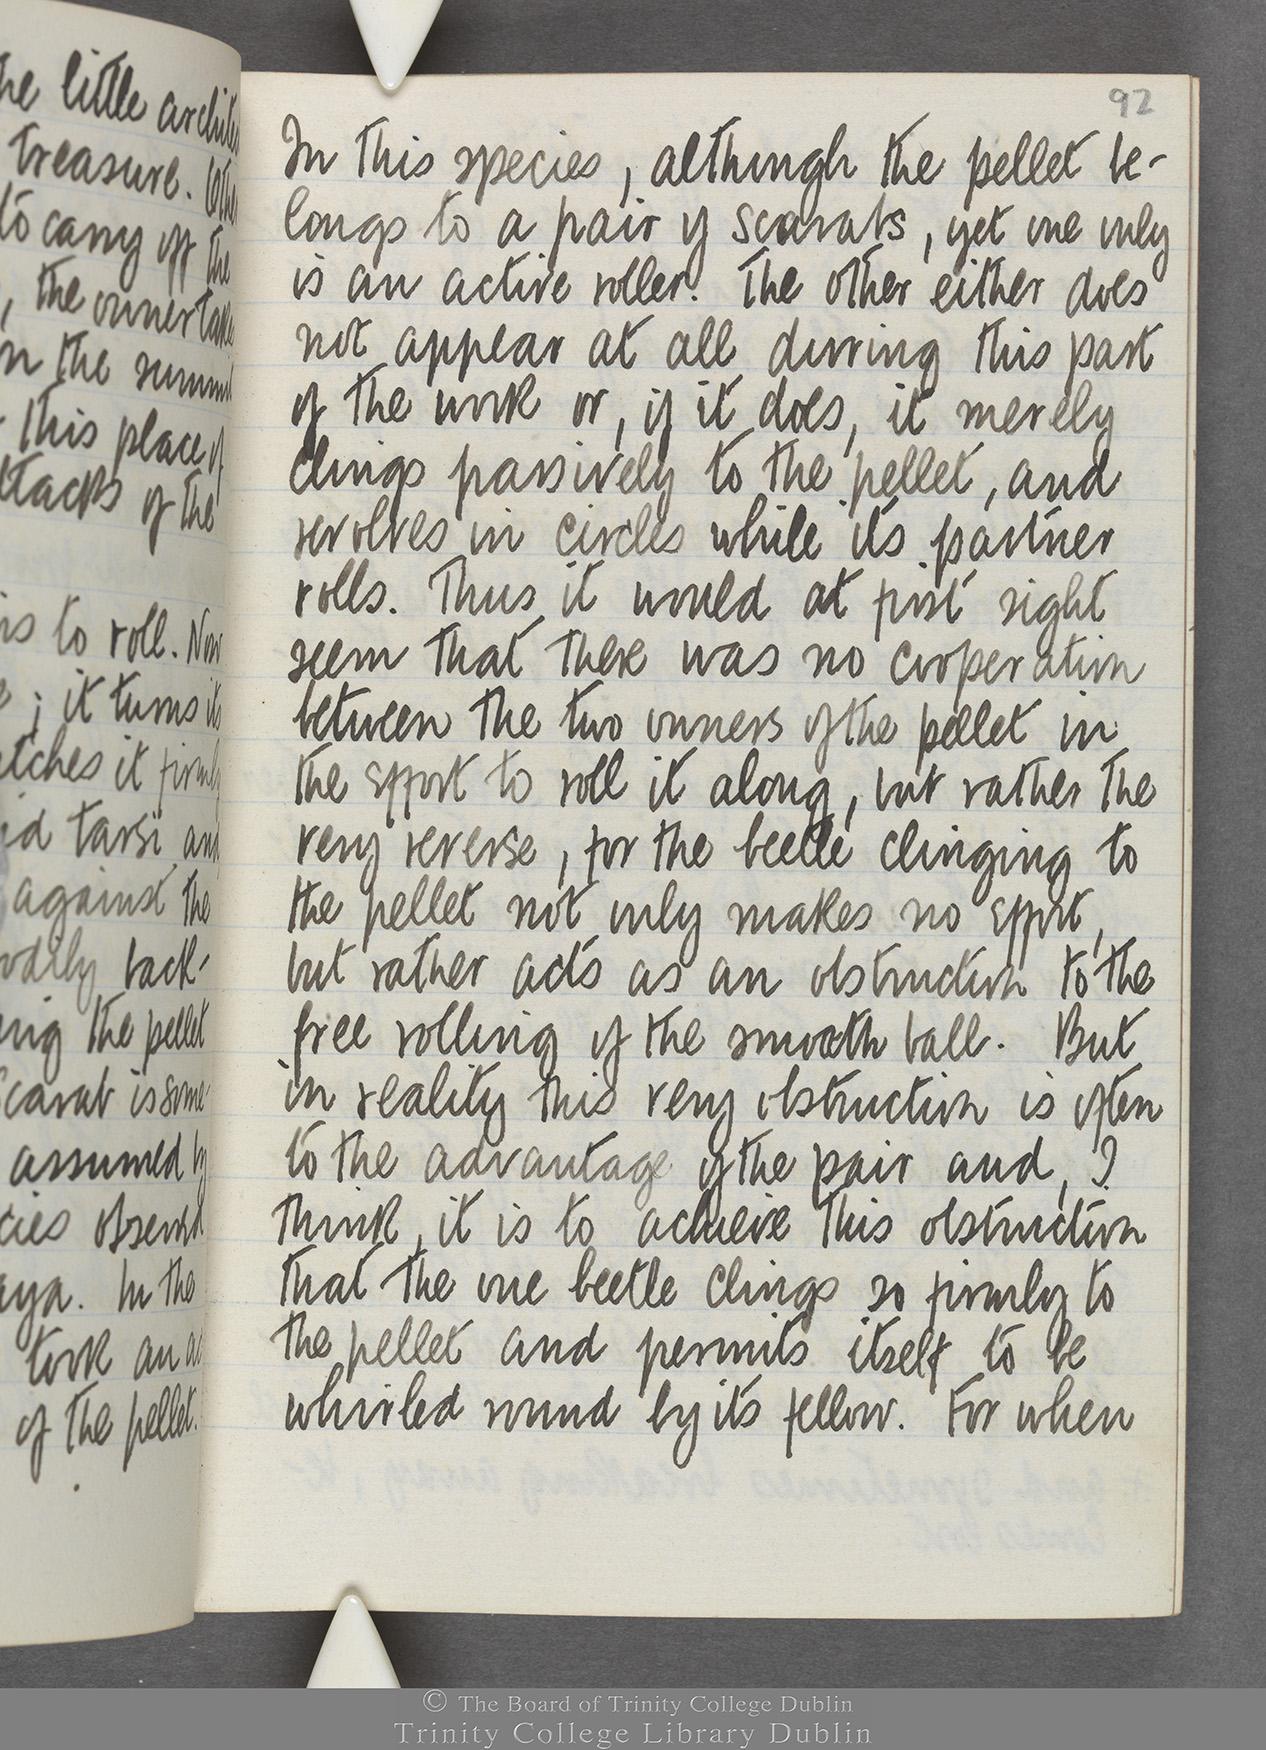 TCD MS 10515 folio 92 recto